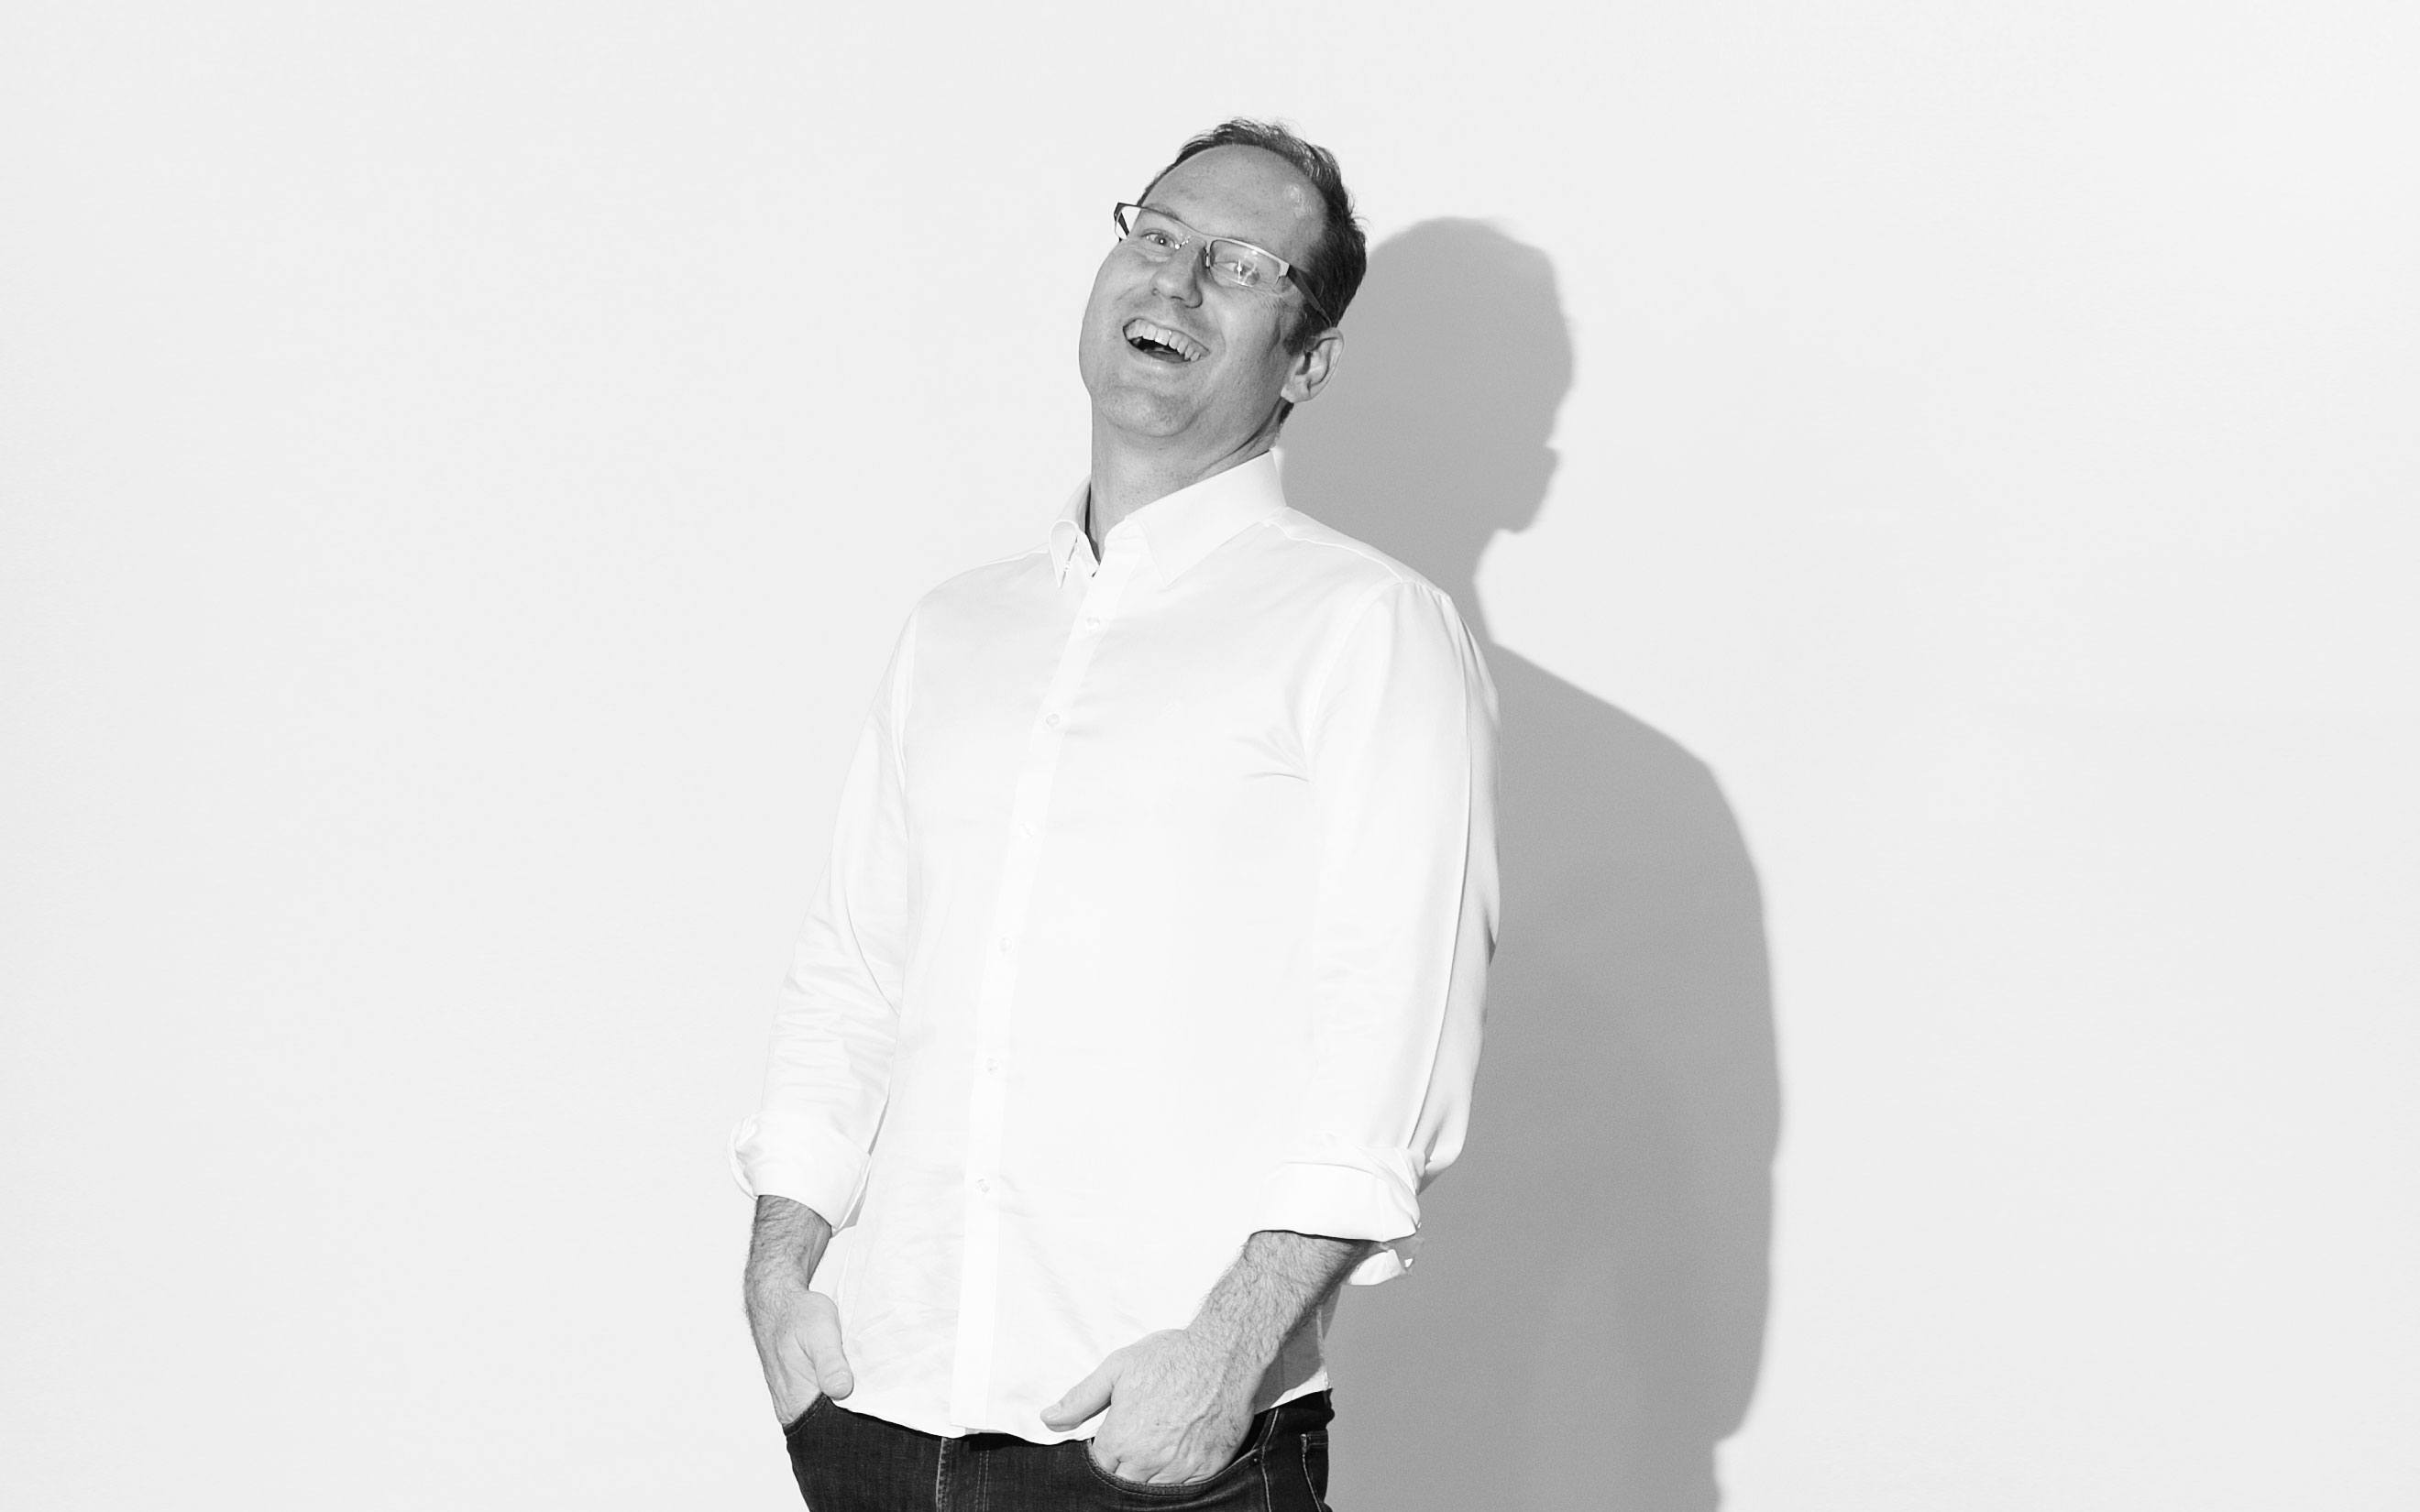 Michael Shilman - Founder of Hello Money